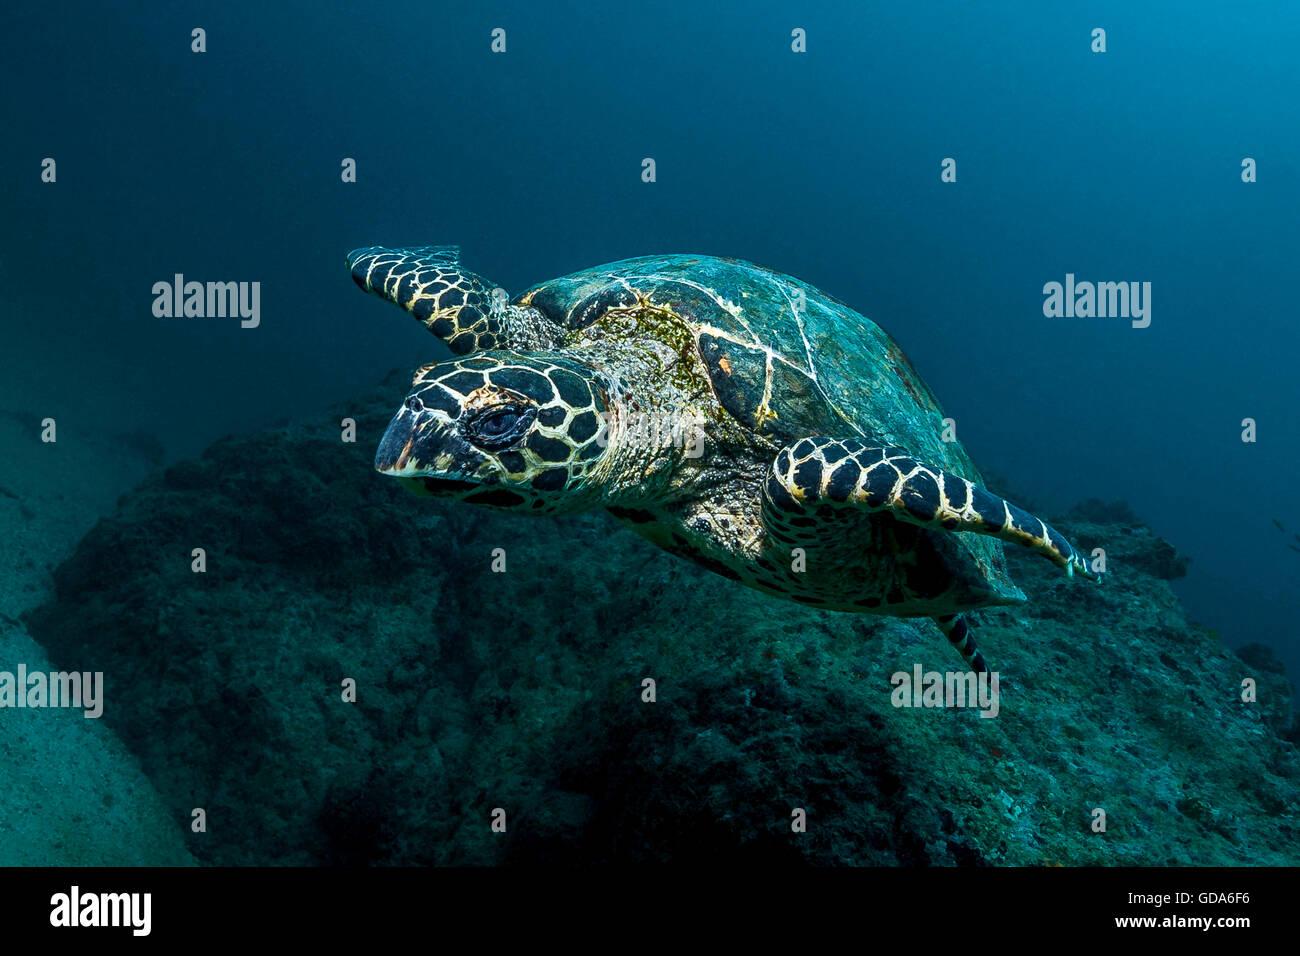 Hawksbill Sea Turtle, Eretmochelys imbricata, Cano Island, Drake Bay, Costa Rica - Stock Image